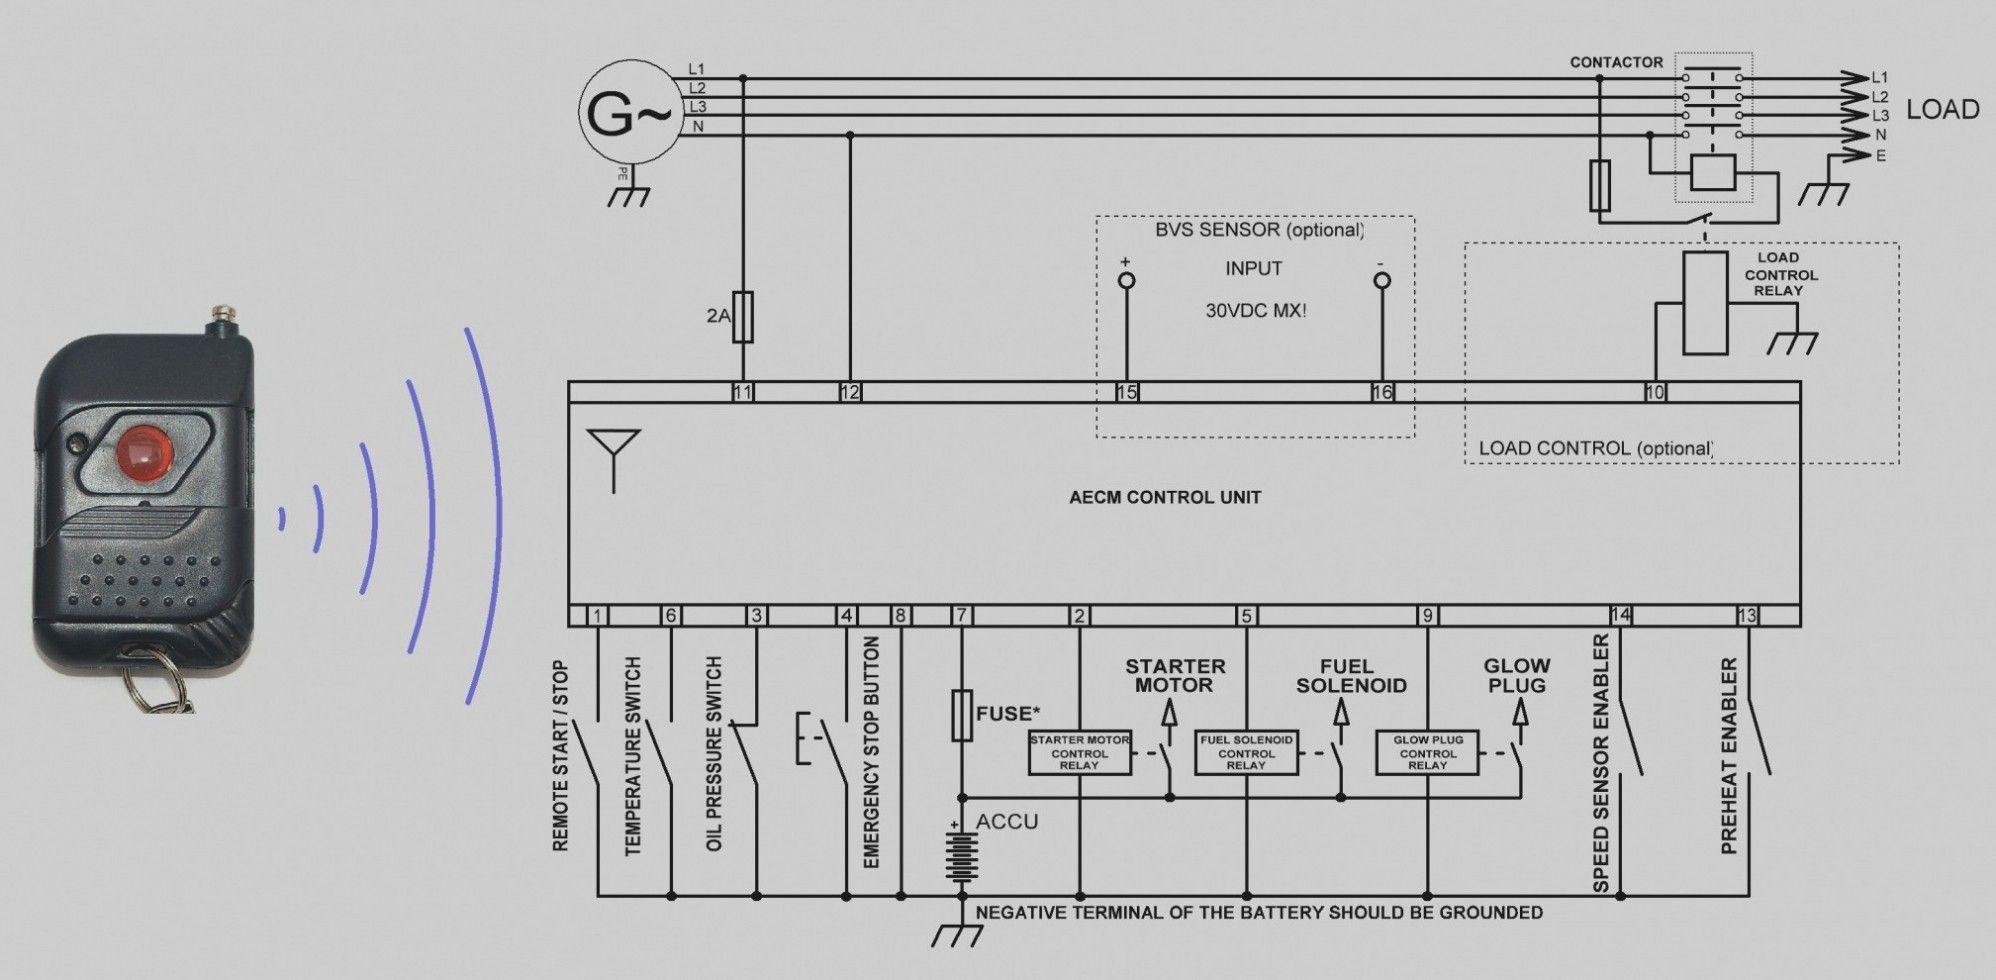 Unique Electric Fan Motor Wiring Diagram Pdf Diagram Diagramsample Diagramtemplate Wiringdiagram Diagramchart Worksheet Workshee Diagram Fan Motor Motor